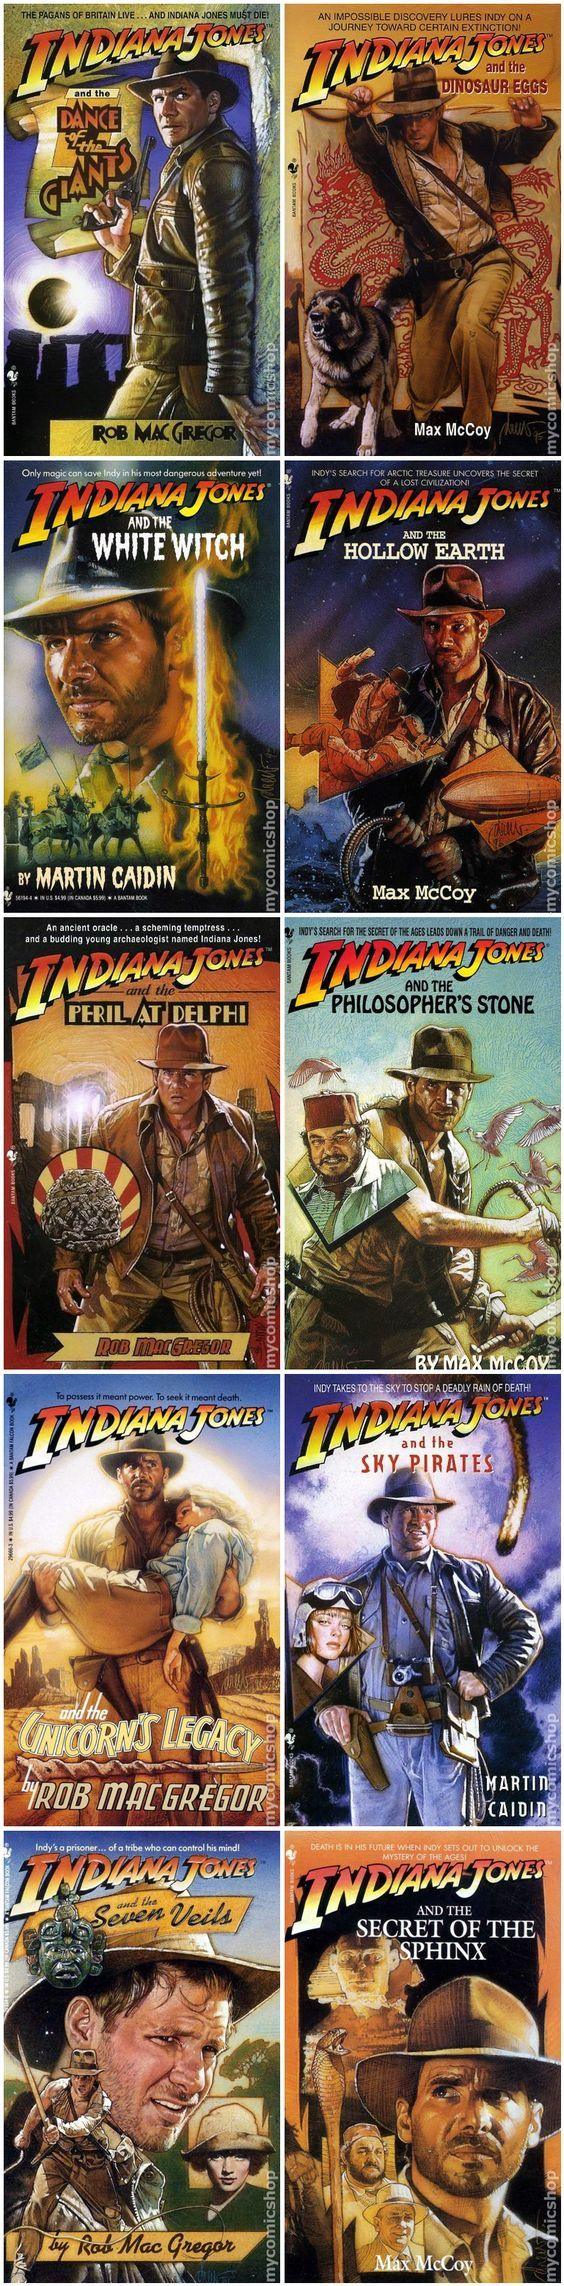 Indiana Jones adventures | mycomicshop #indianajones